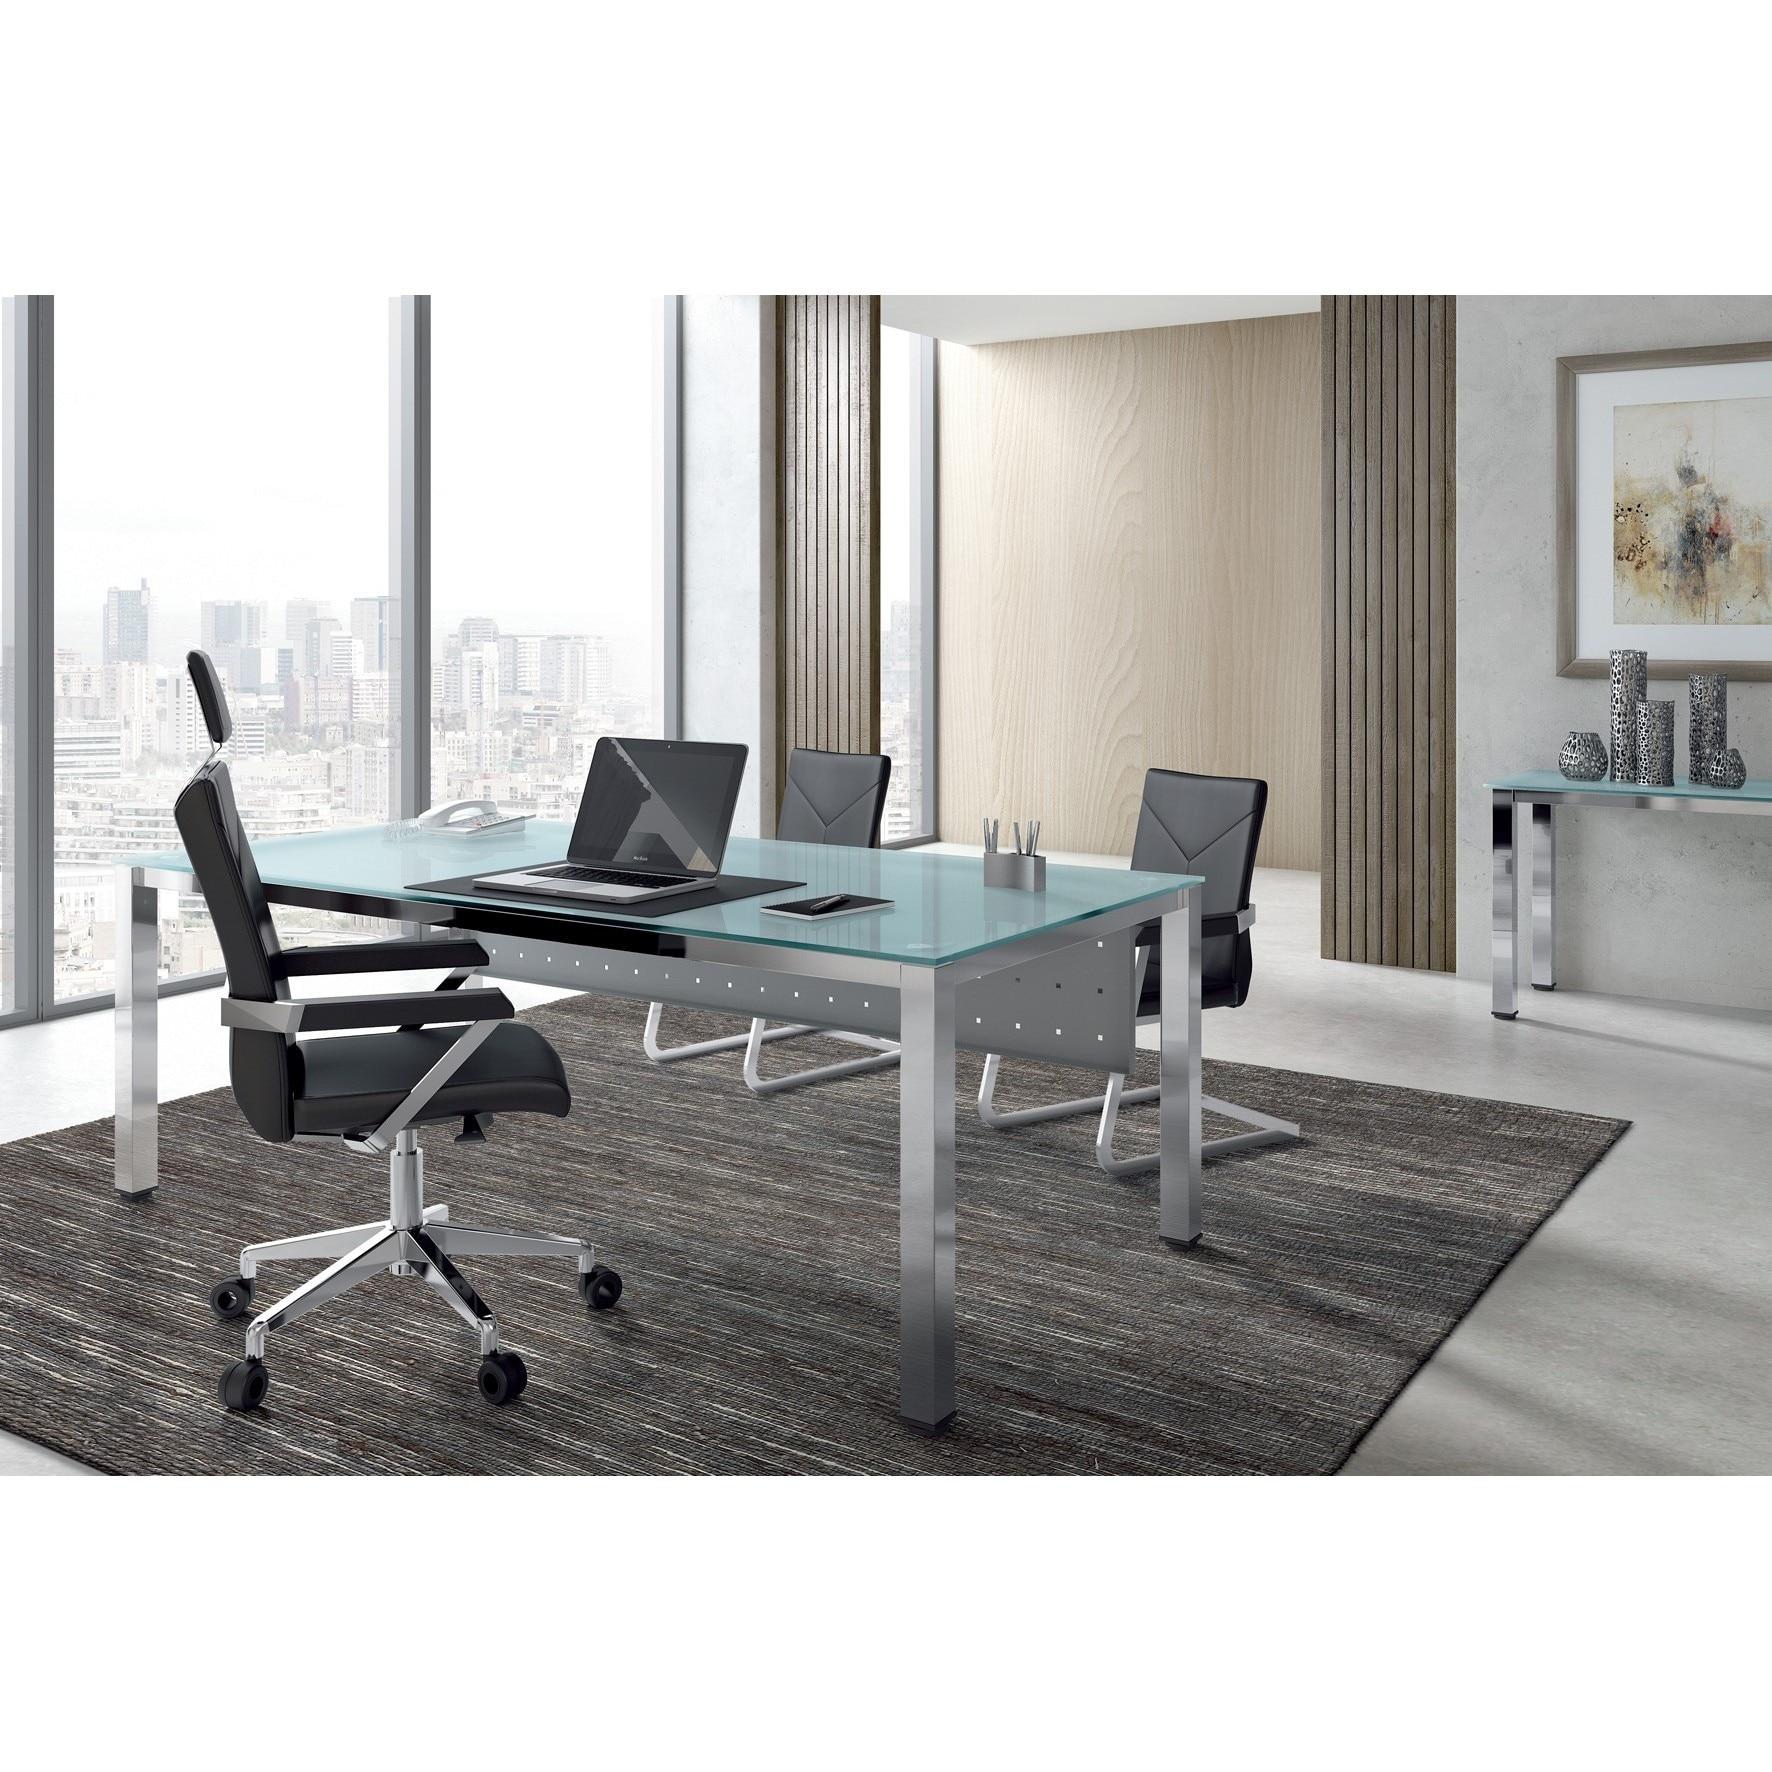 TABLE OFFICE 'S EXECUTIVE SERIES 140X80 ALUMINUM/CRYSTAL